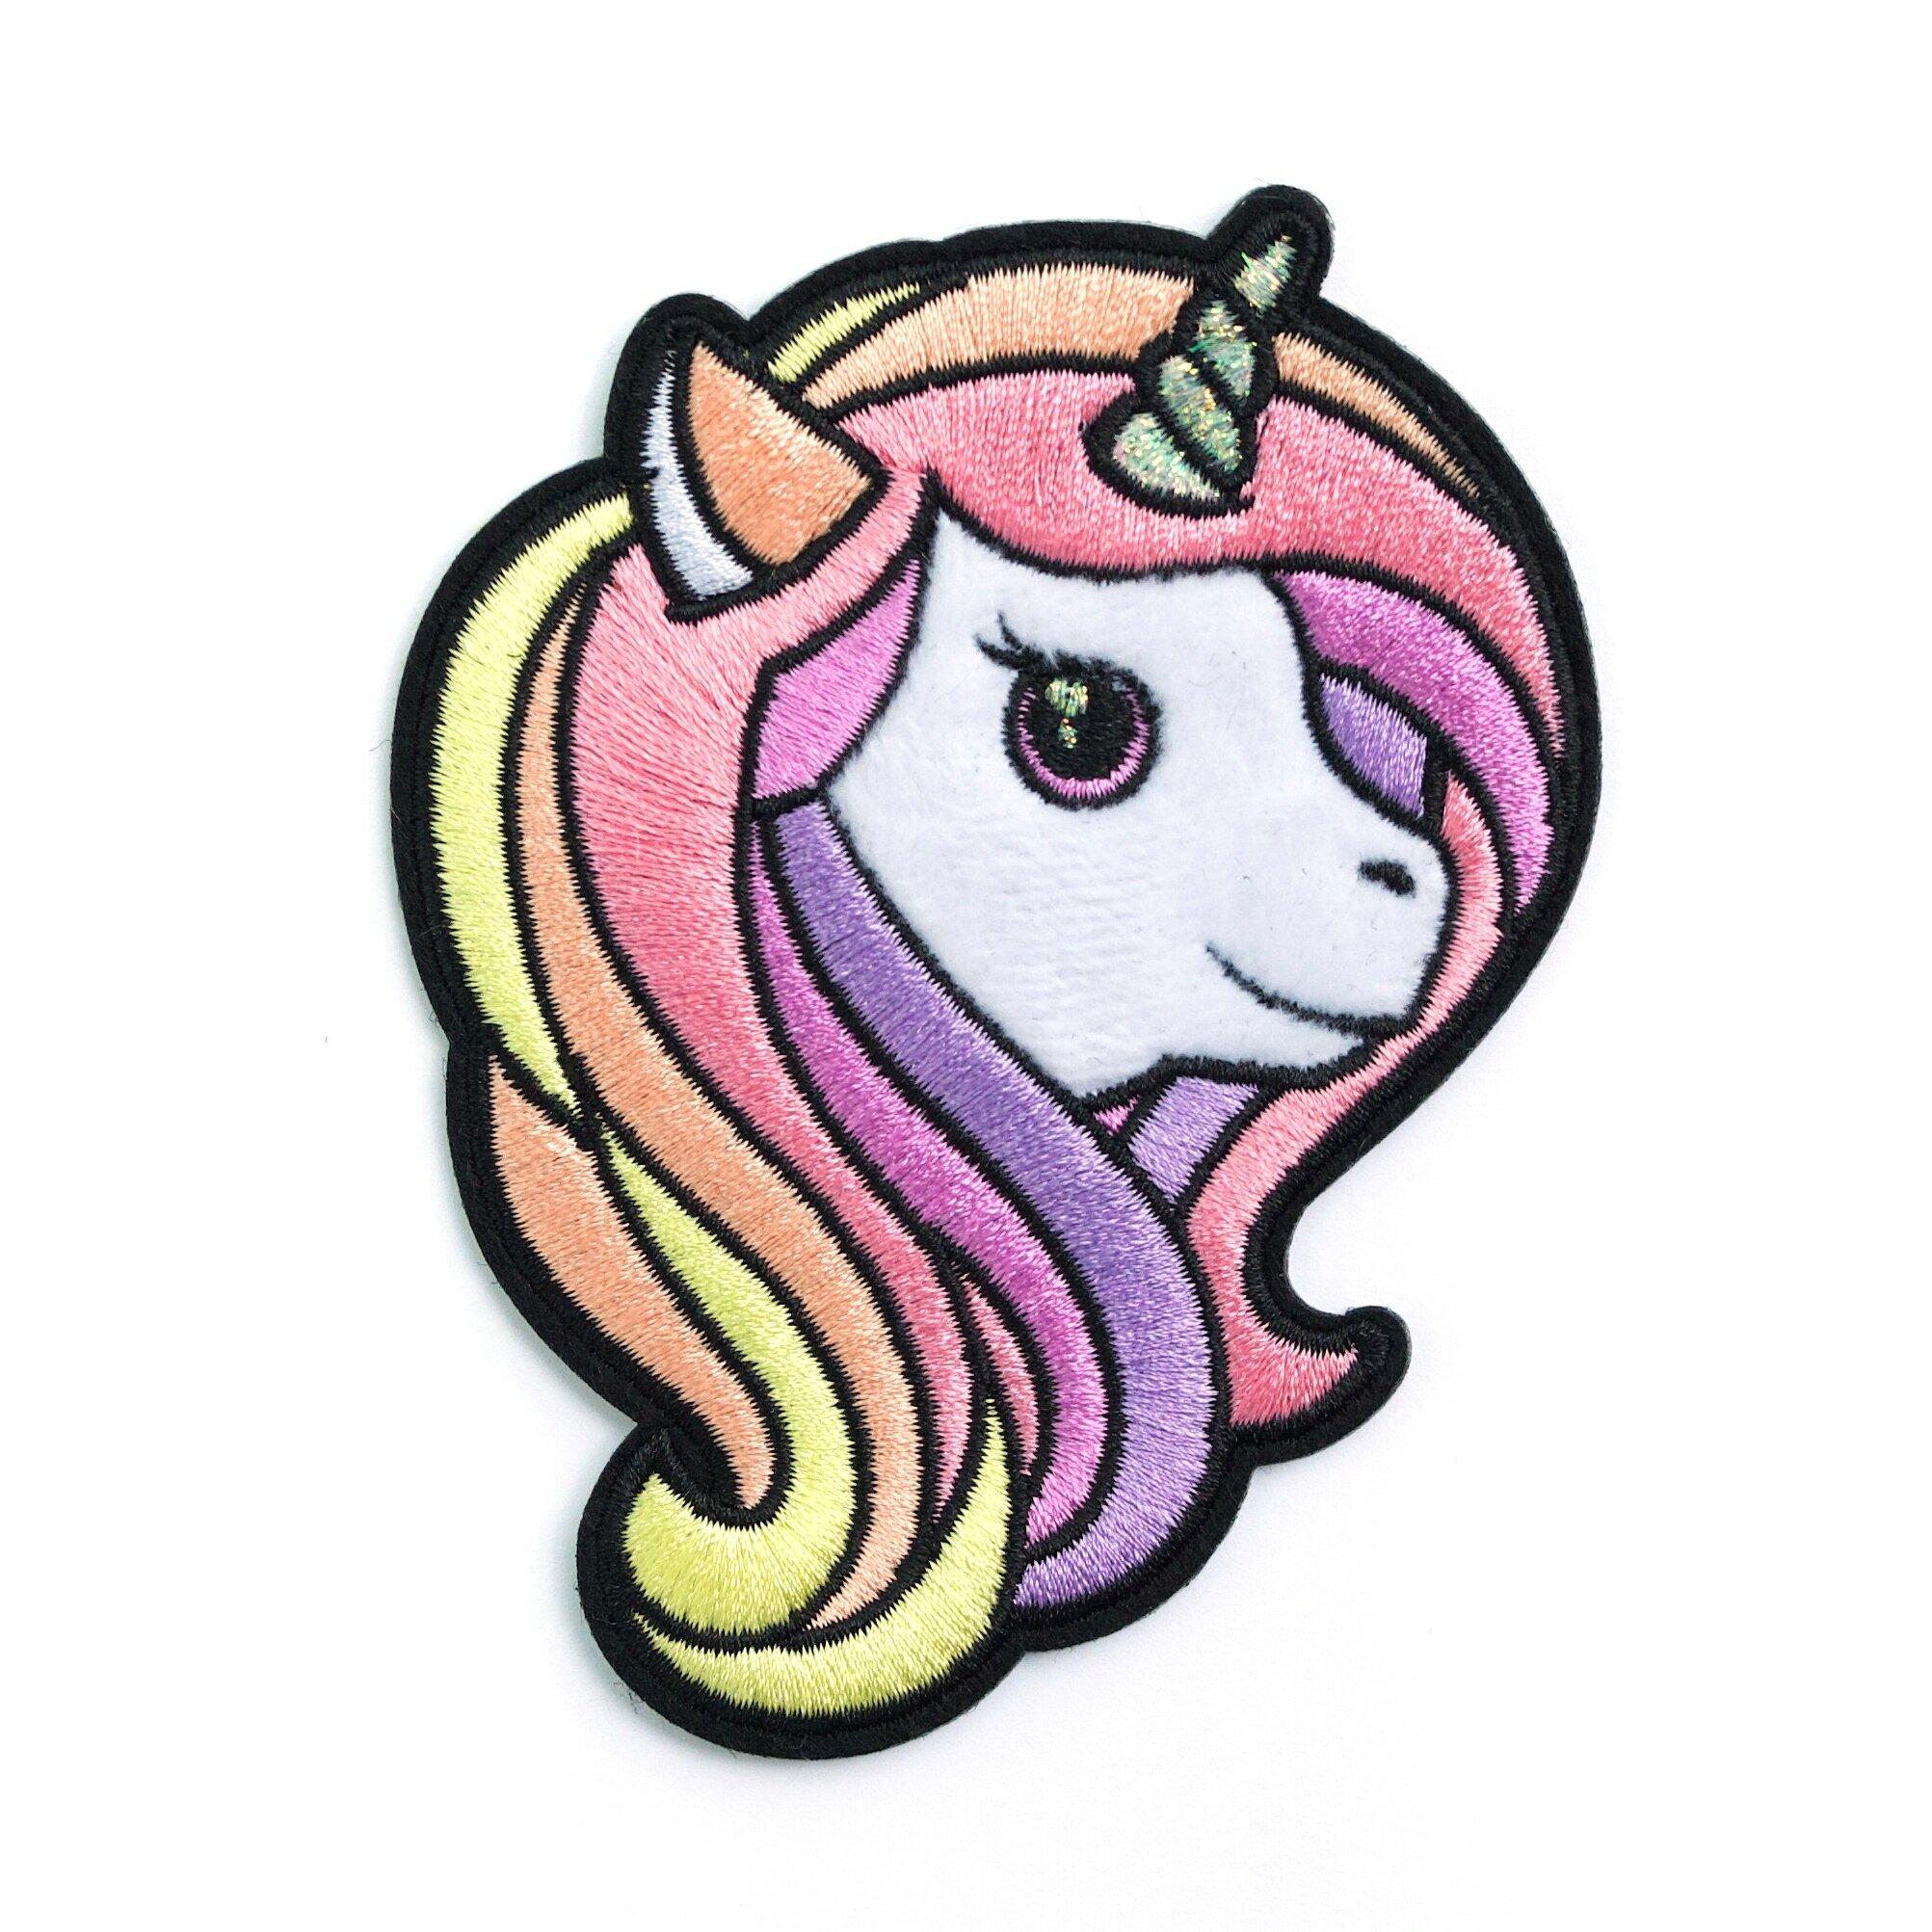 A6 - Unicorn Patch